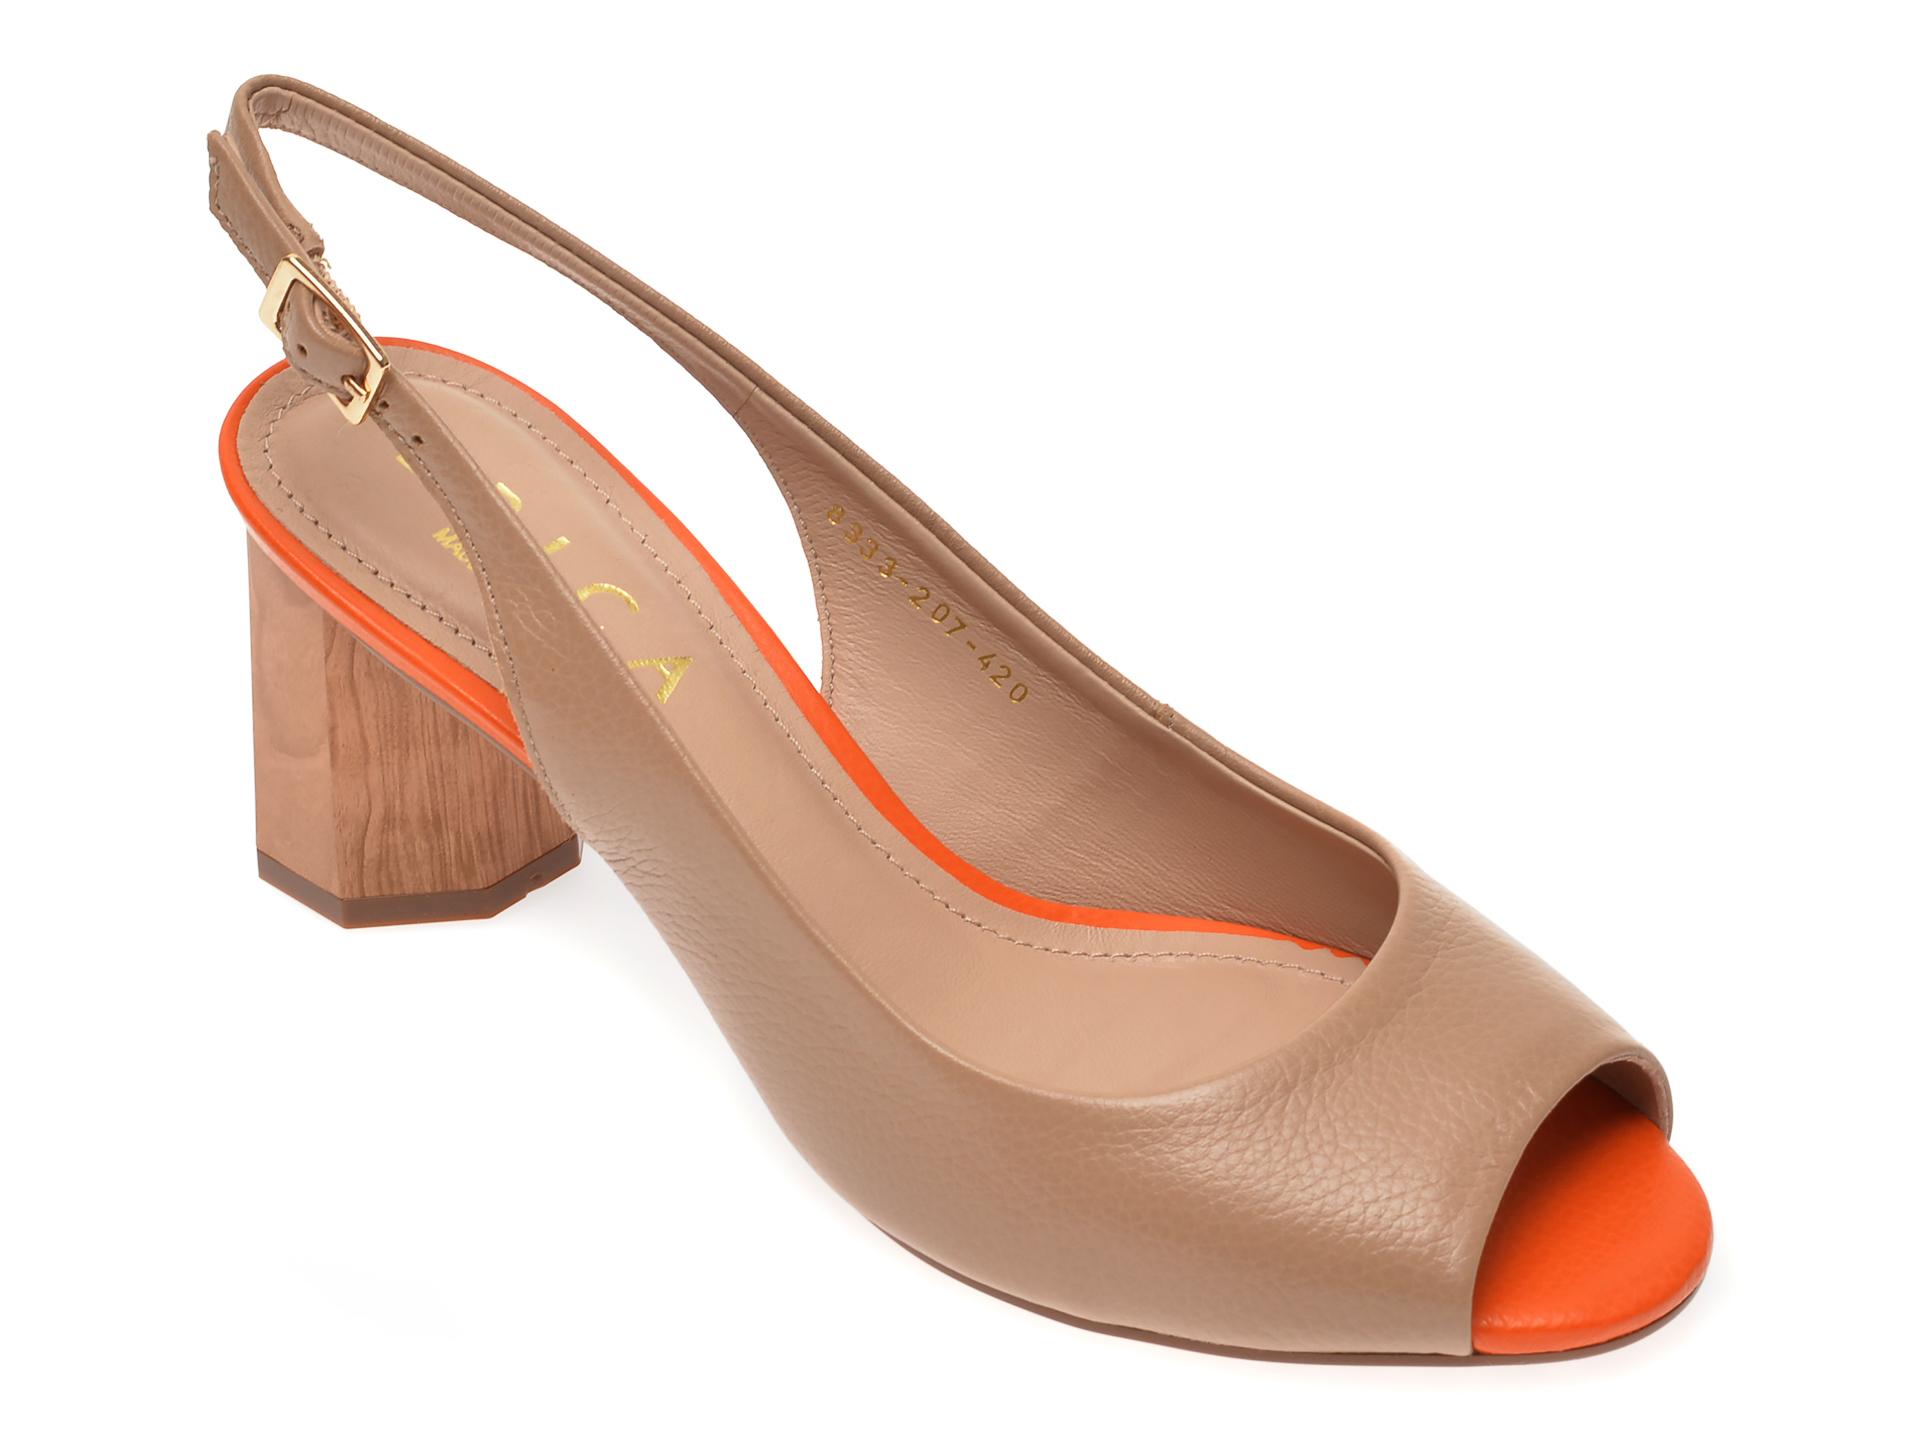 Sandale EPICA bej, 8333207, din piele naturala